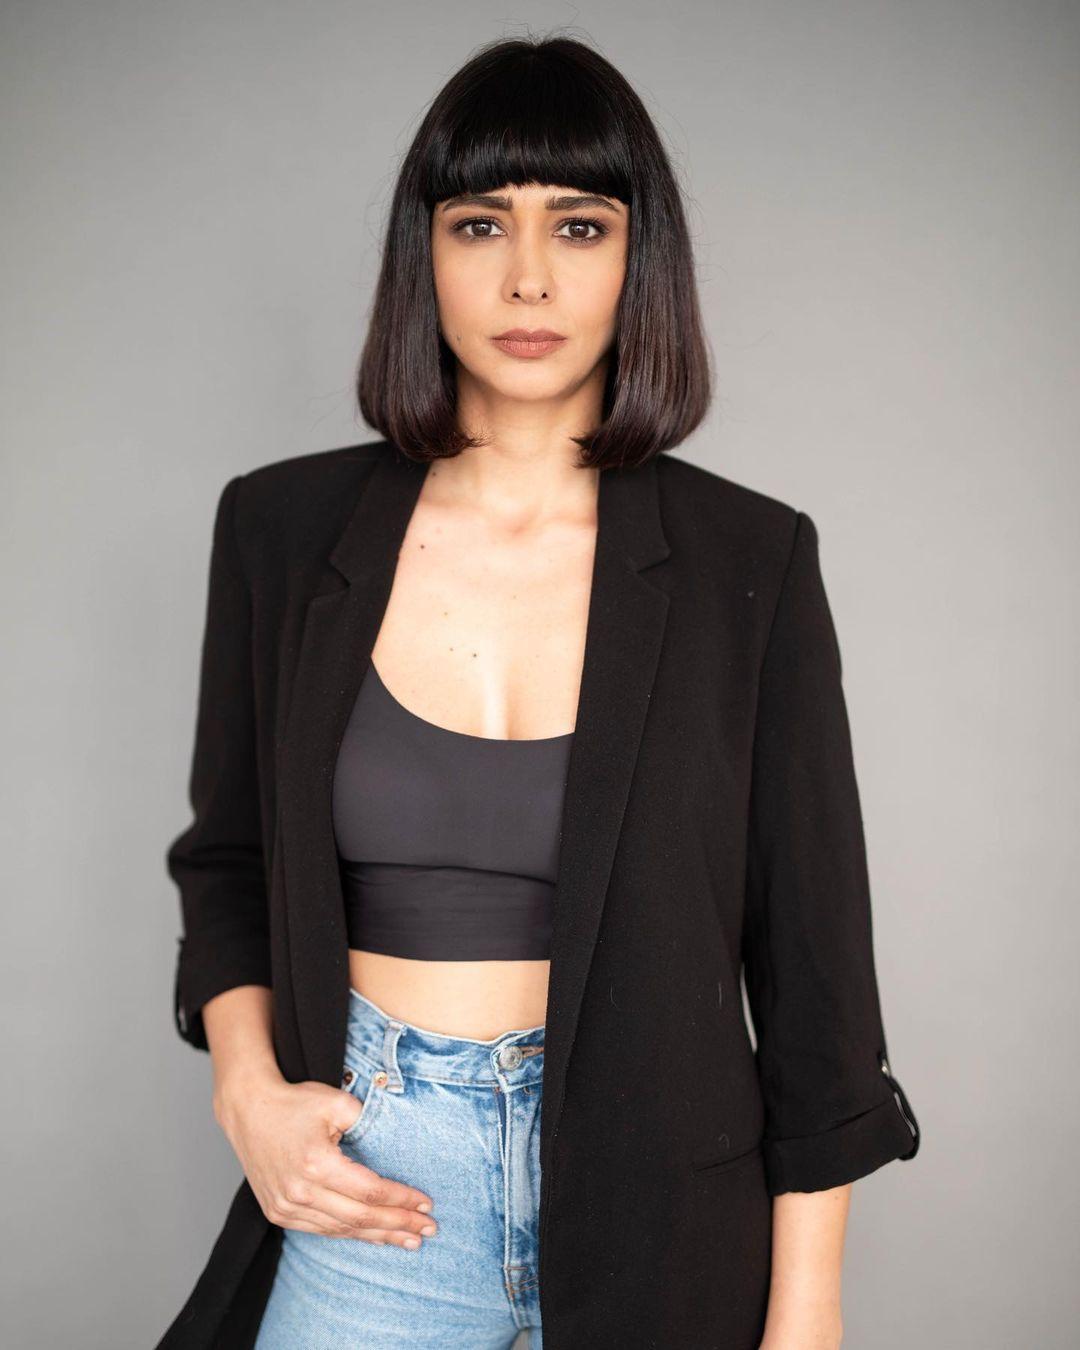 Actress Shot By Israeli Police